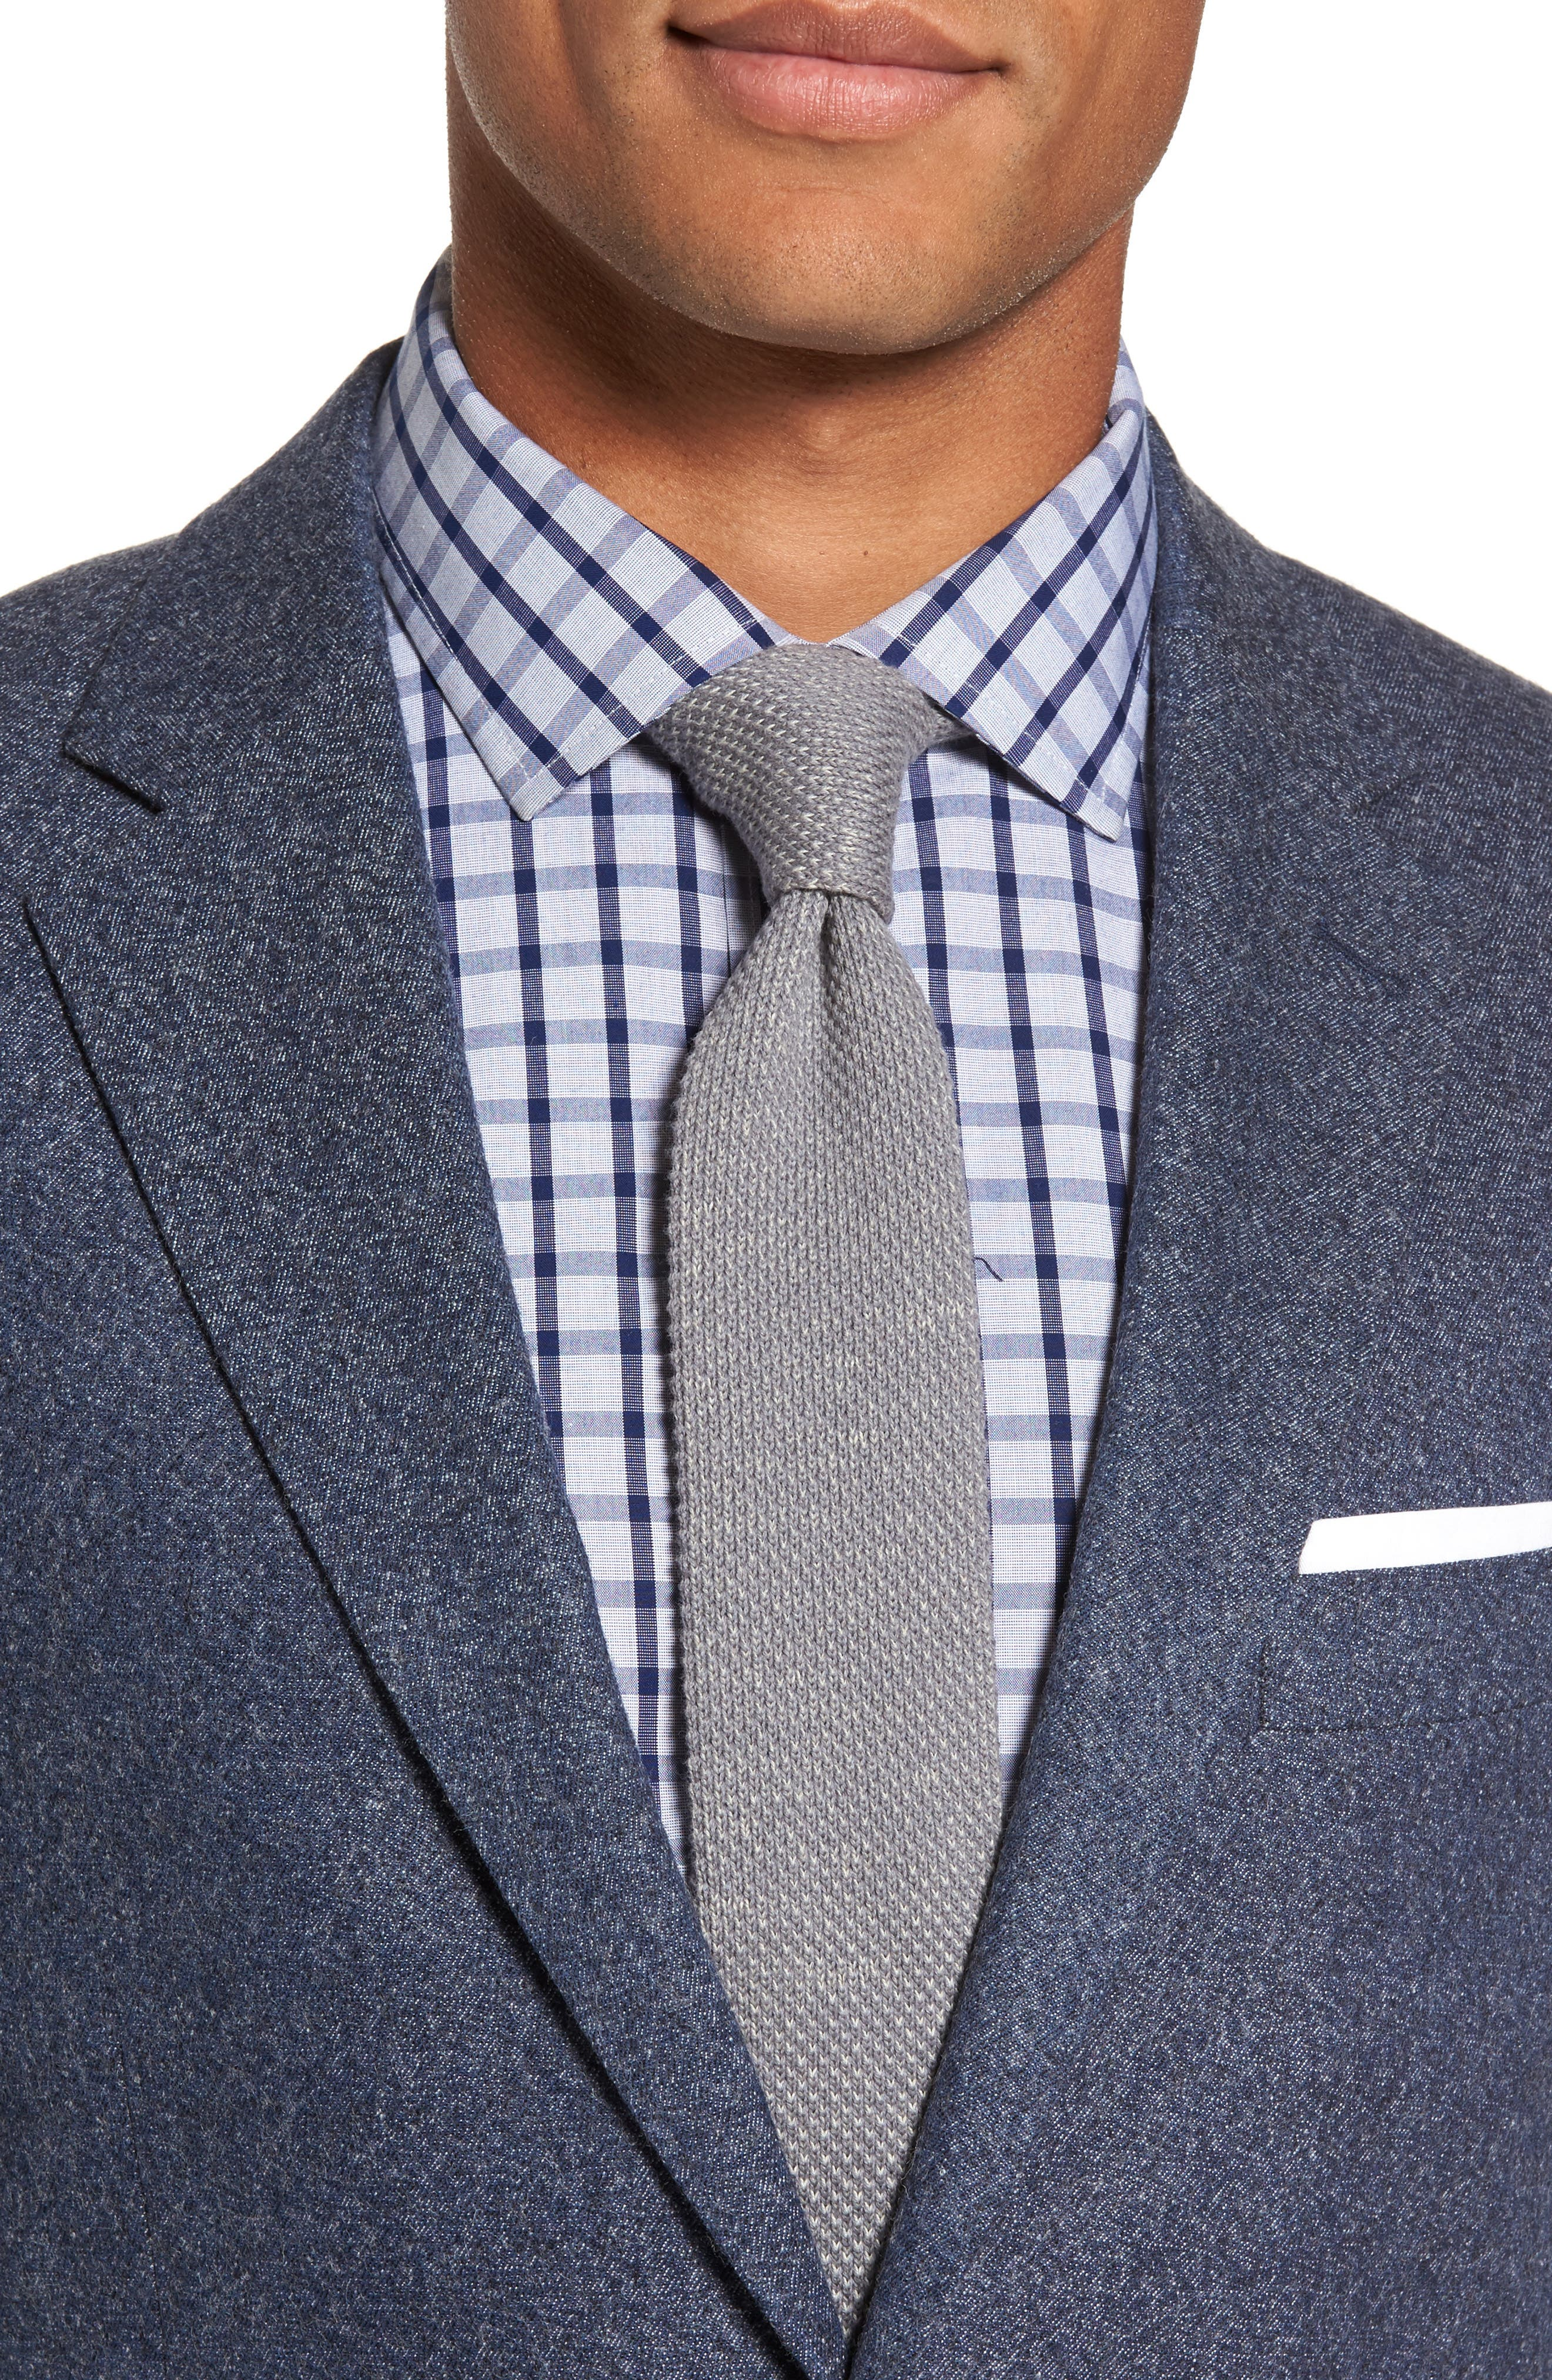 Charleston Wool Blend Sport Coat,                             Alternate thumbnail 4, color,                             414